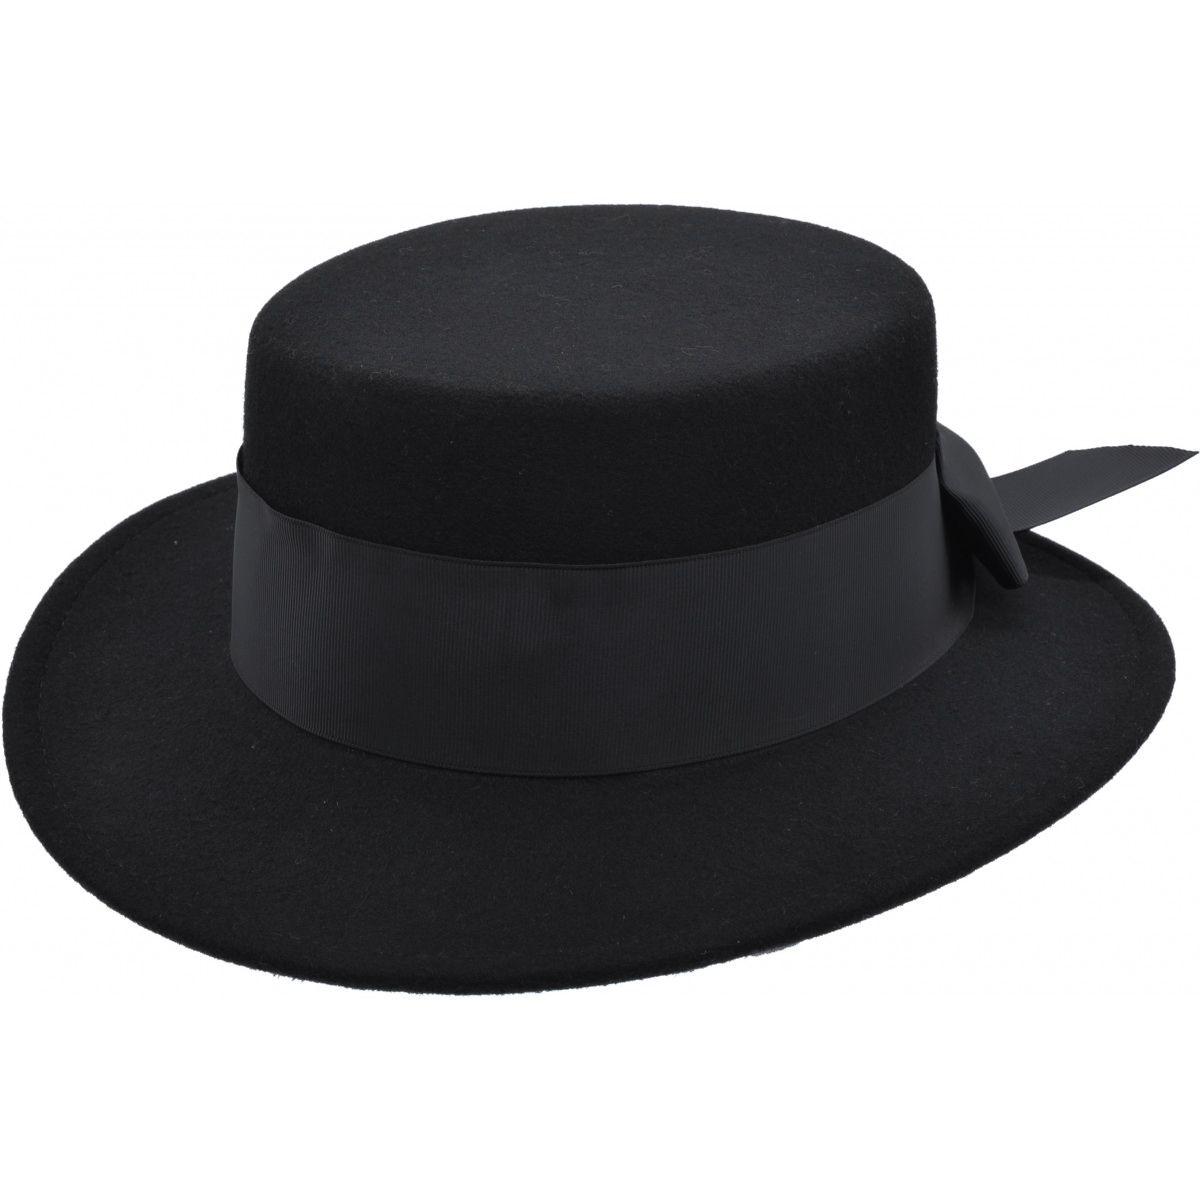 eae2973b_chapeau-retro-pin-up-40-s-50-s-glam-chic-bella-noir